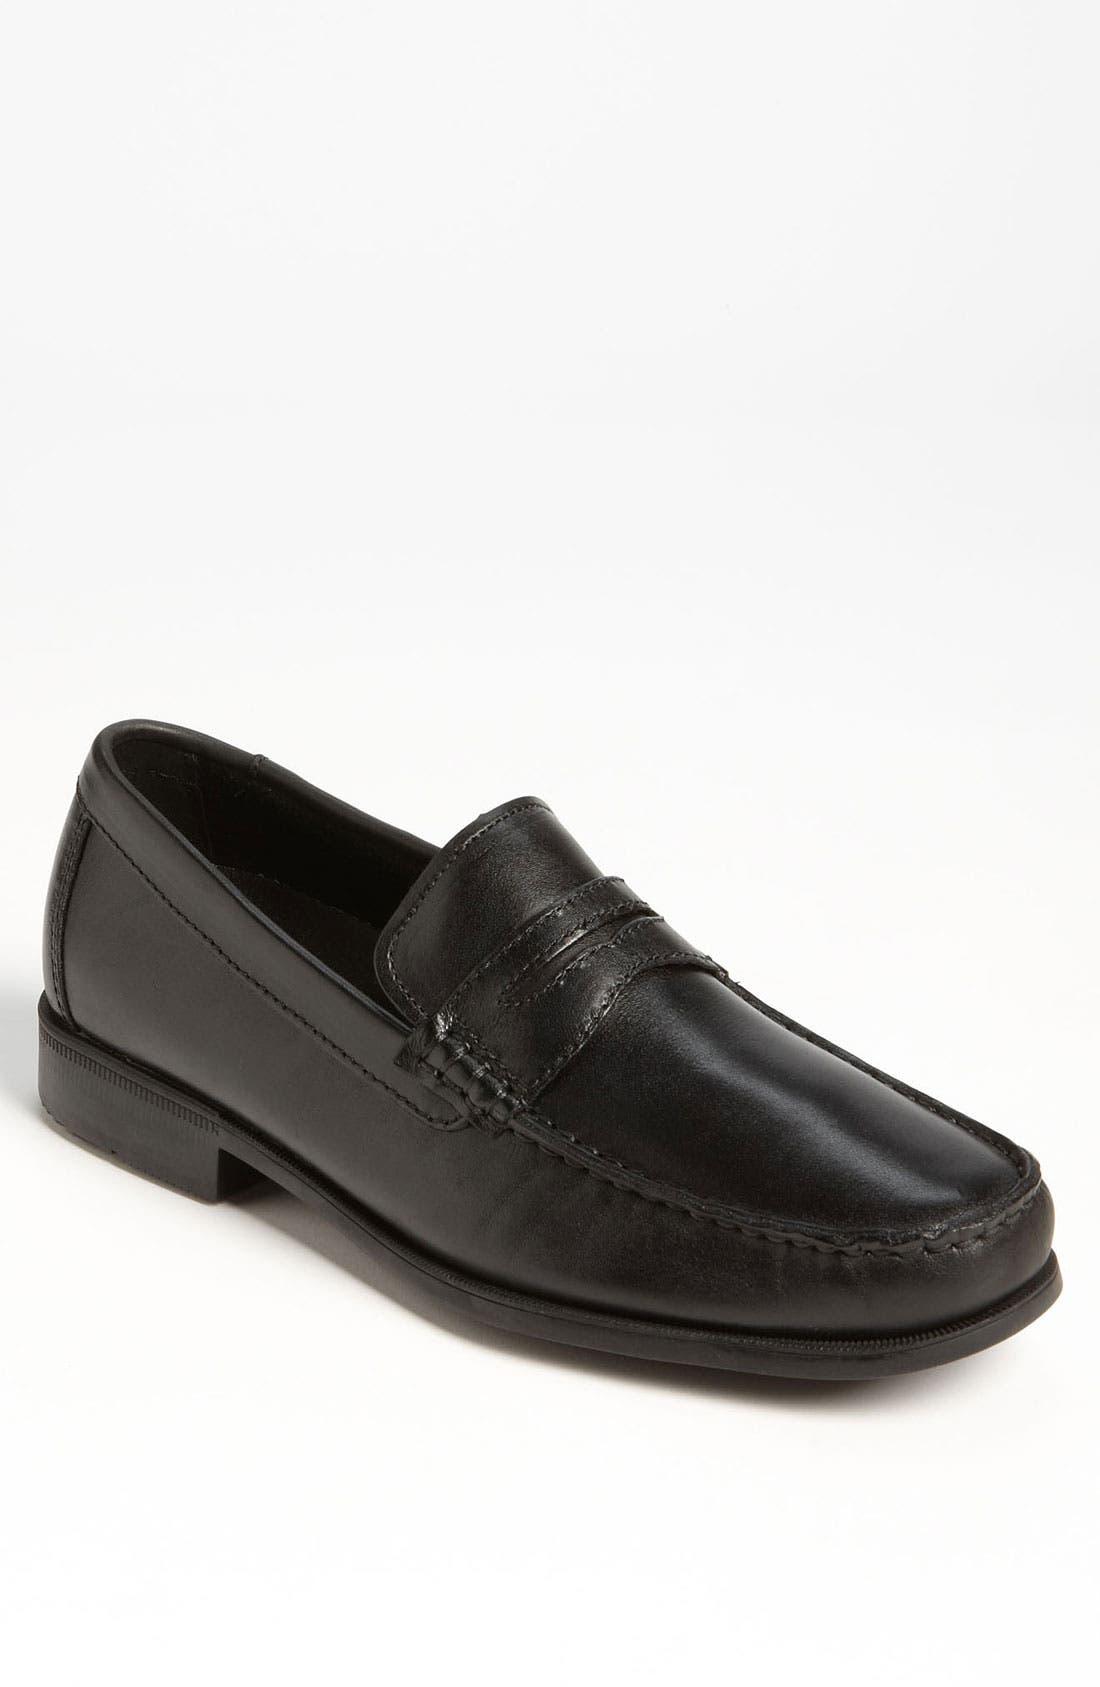 Main Image - Sebago 'Back Bay Classic' Loafer (Online Only)